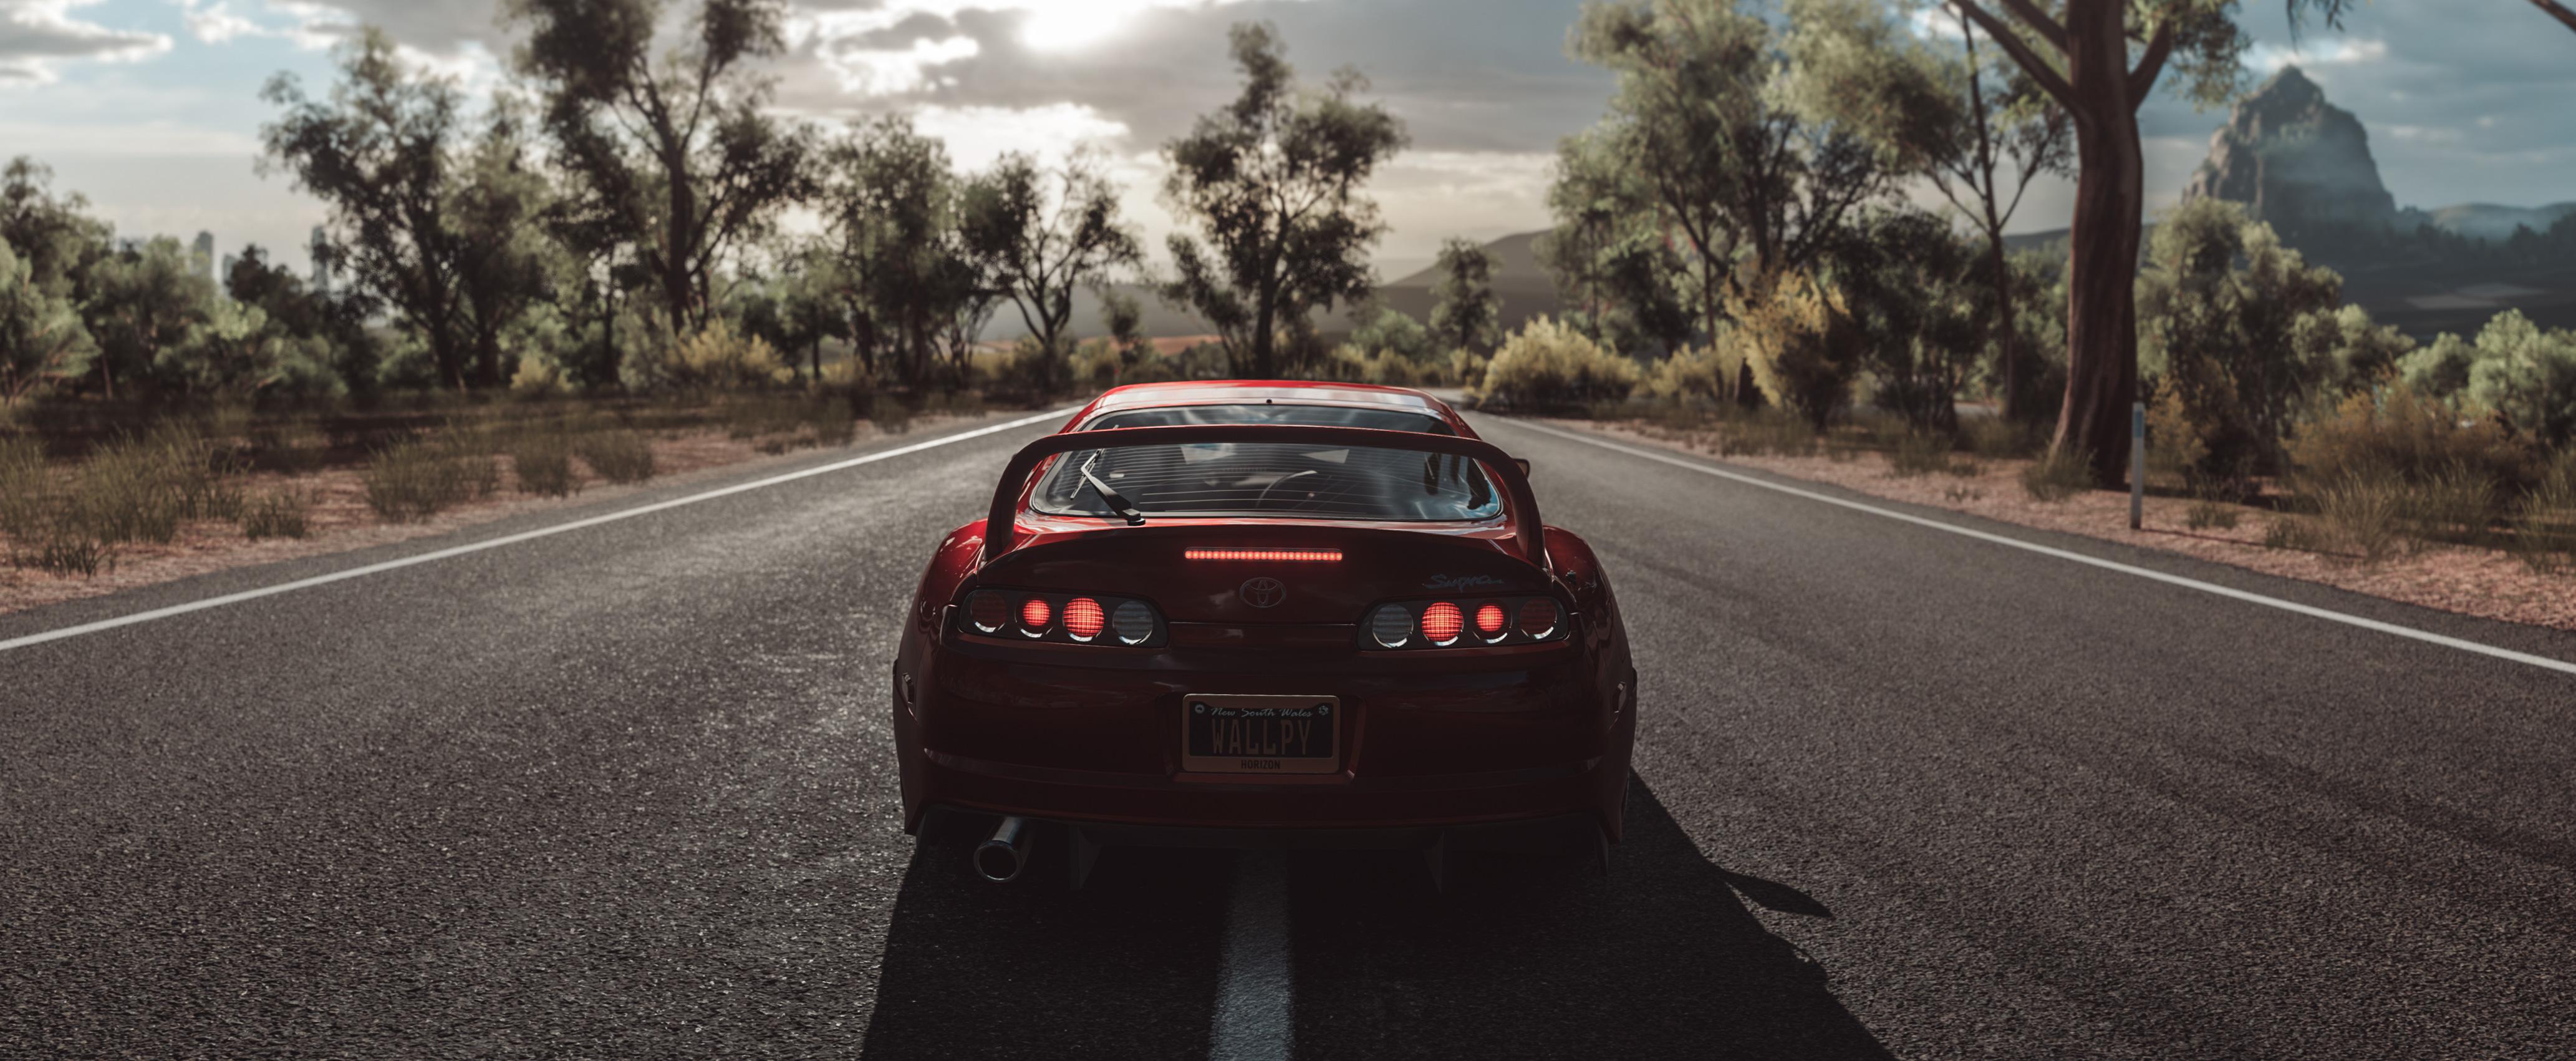 Forza Horizon 3 Toyota Supra Hd Games 4k Wallpapers Images